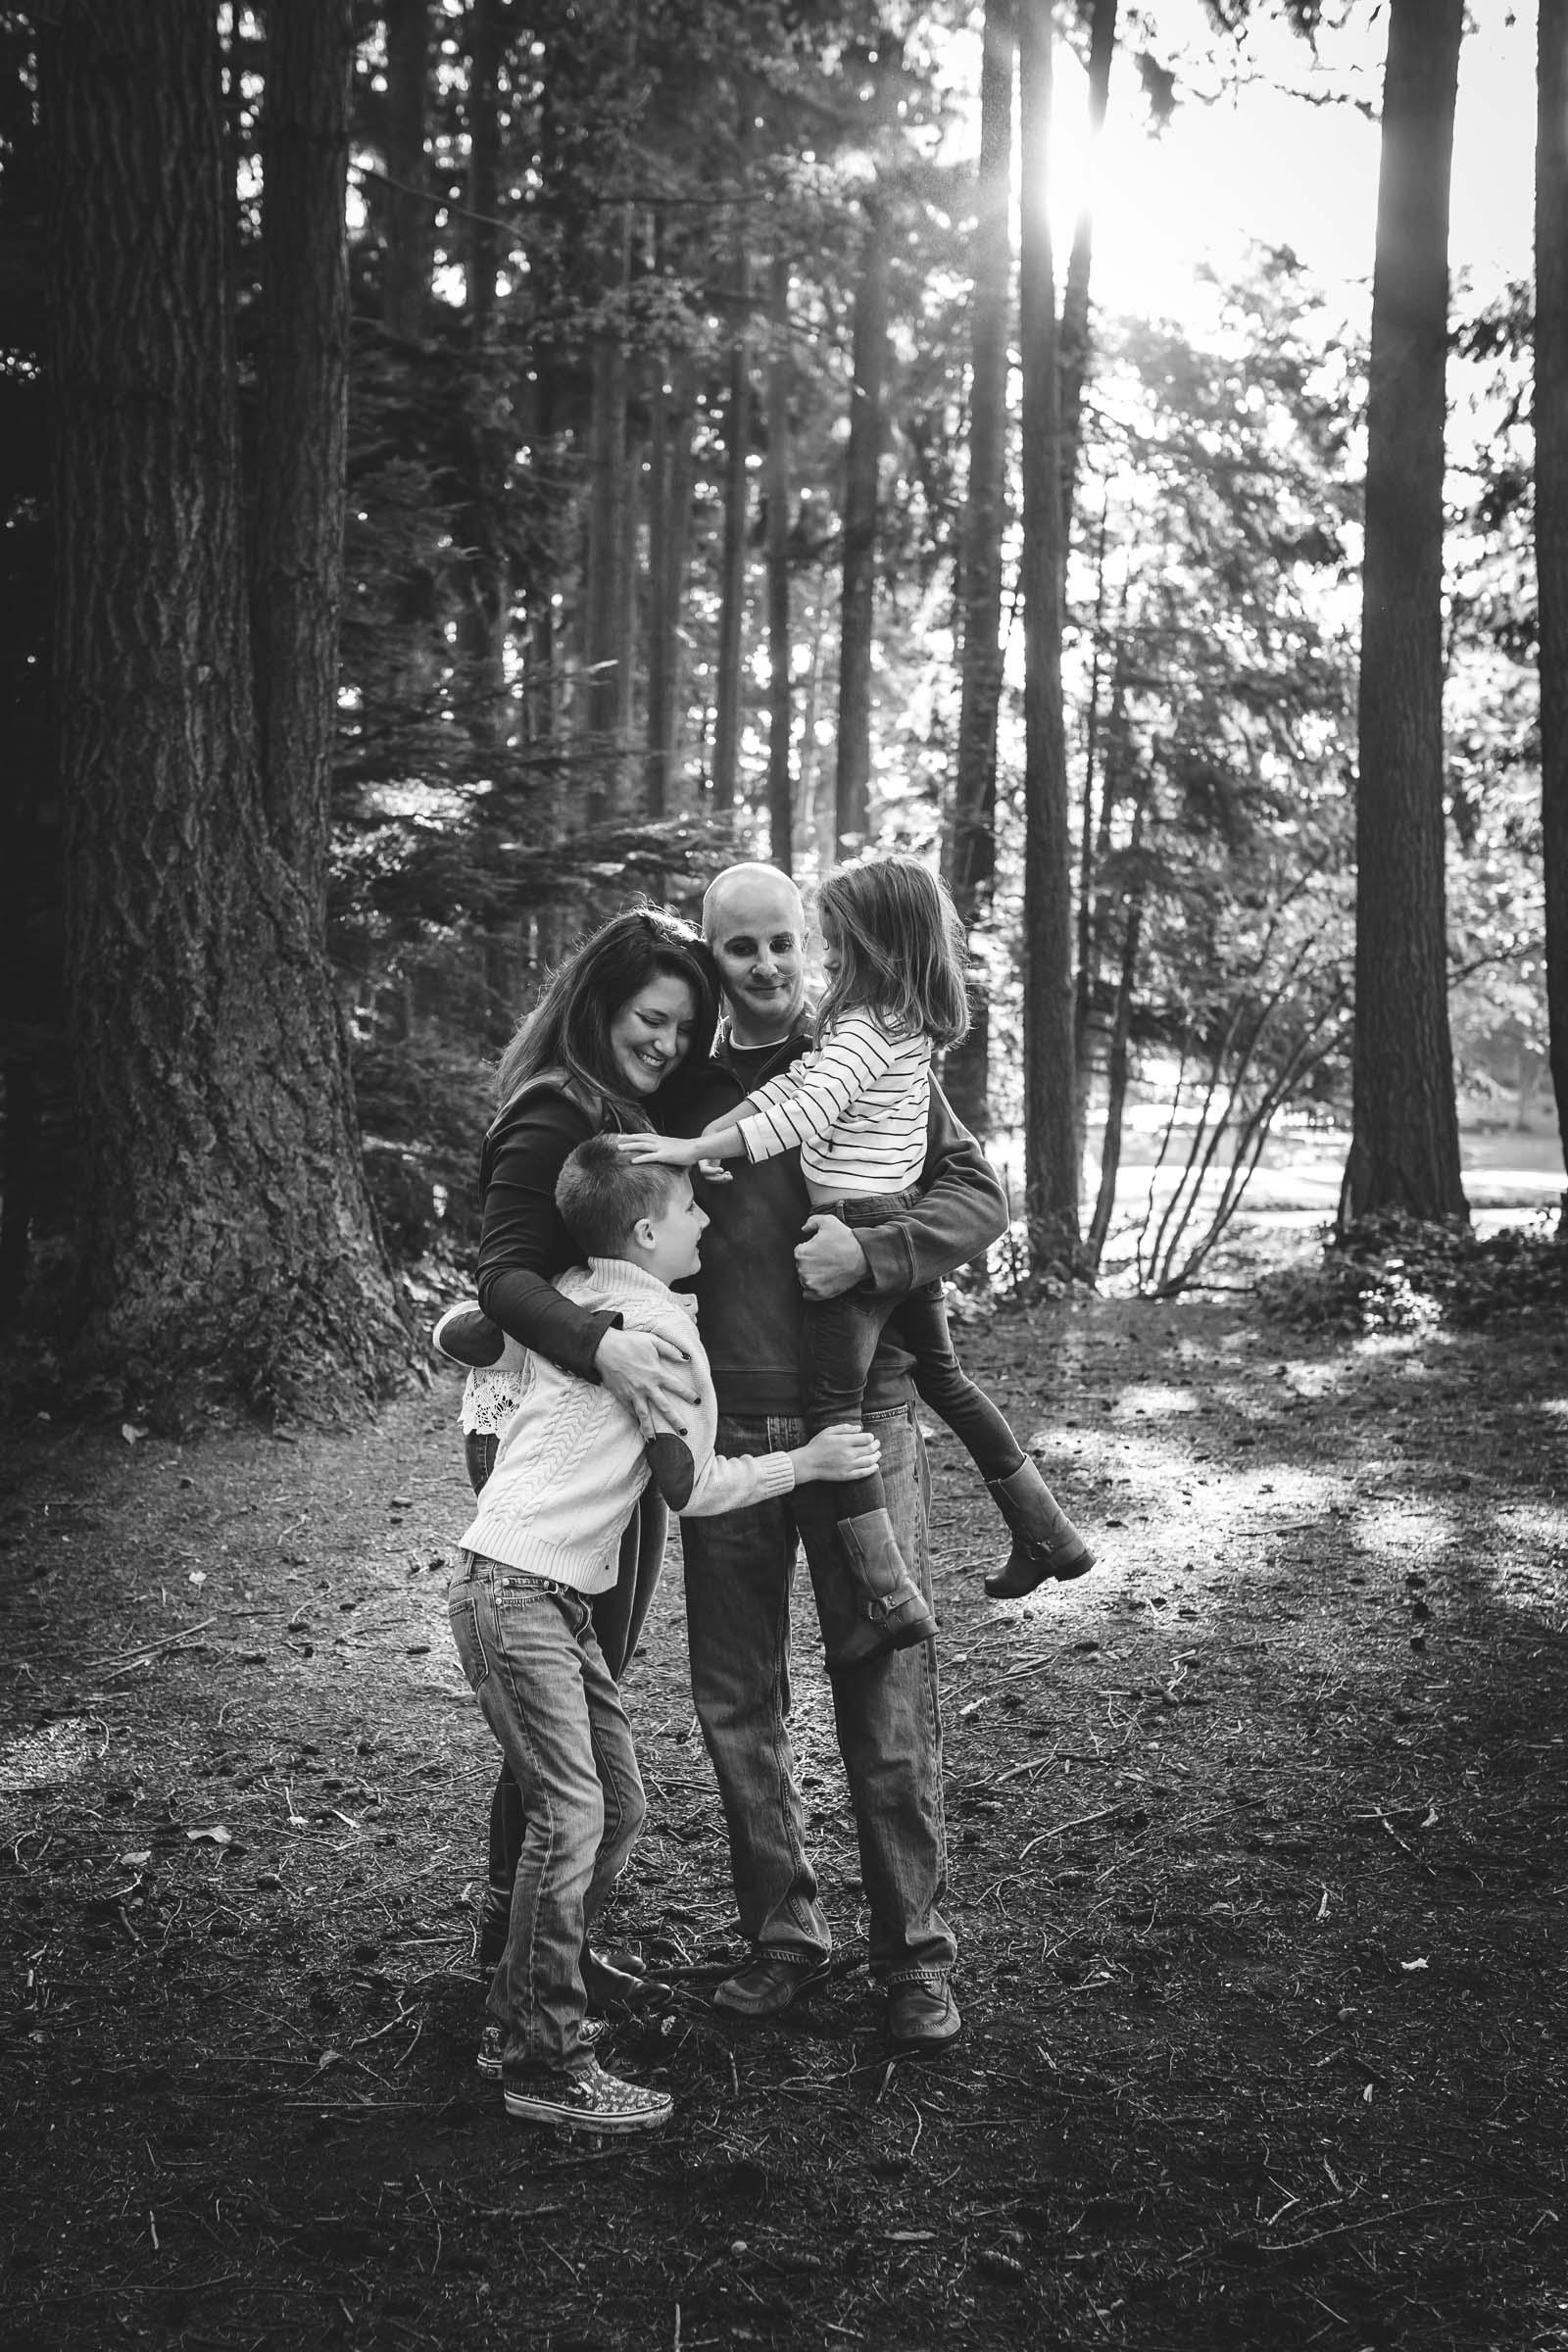 Megan_hooks_photography_seattle_family_newborn_documentary_lifestlye_photographer -3382.jpg